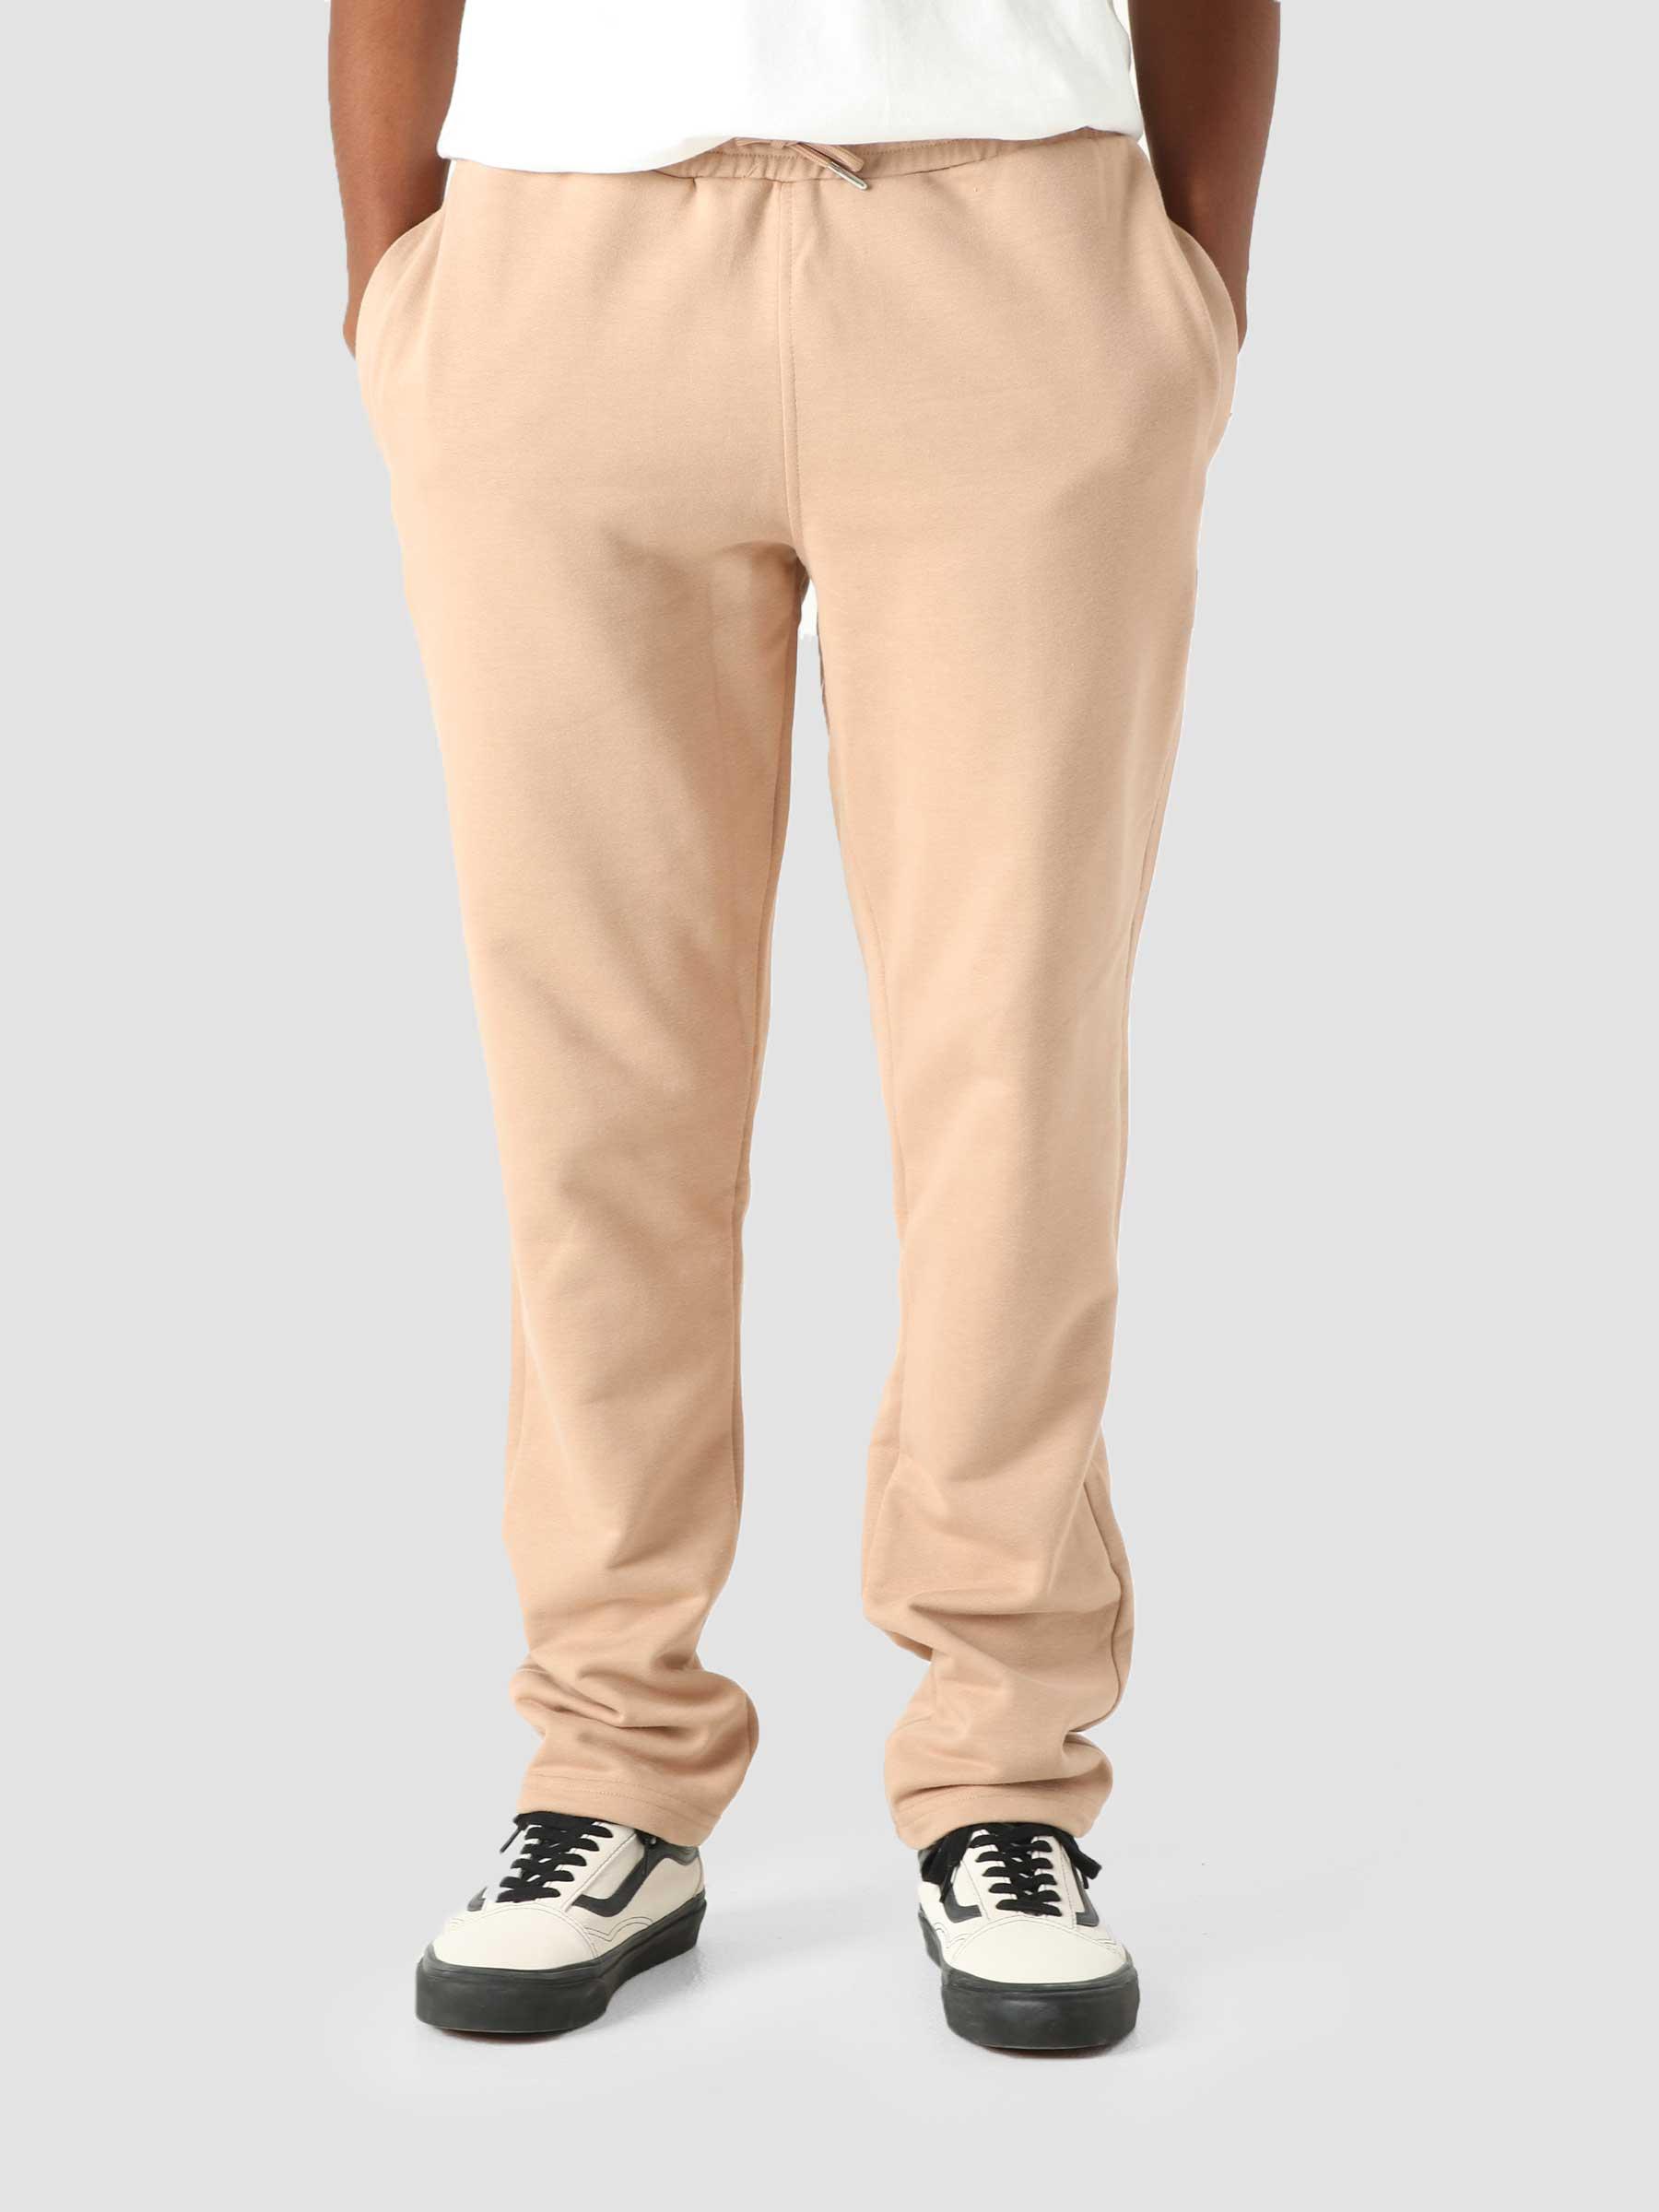 Testudo Trousers Taupe